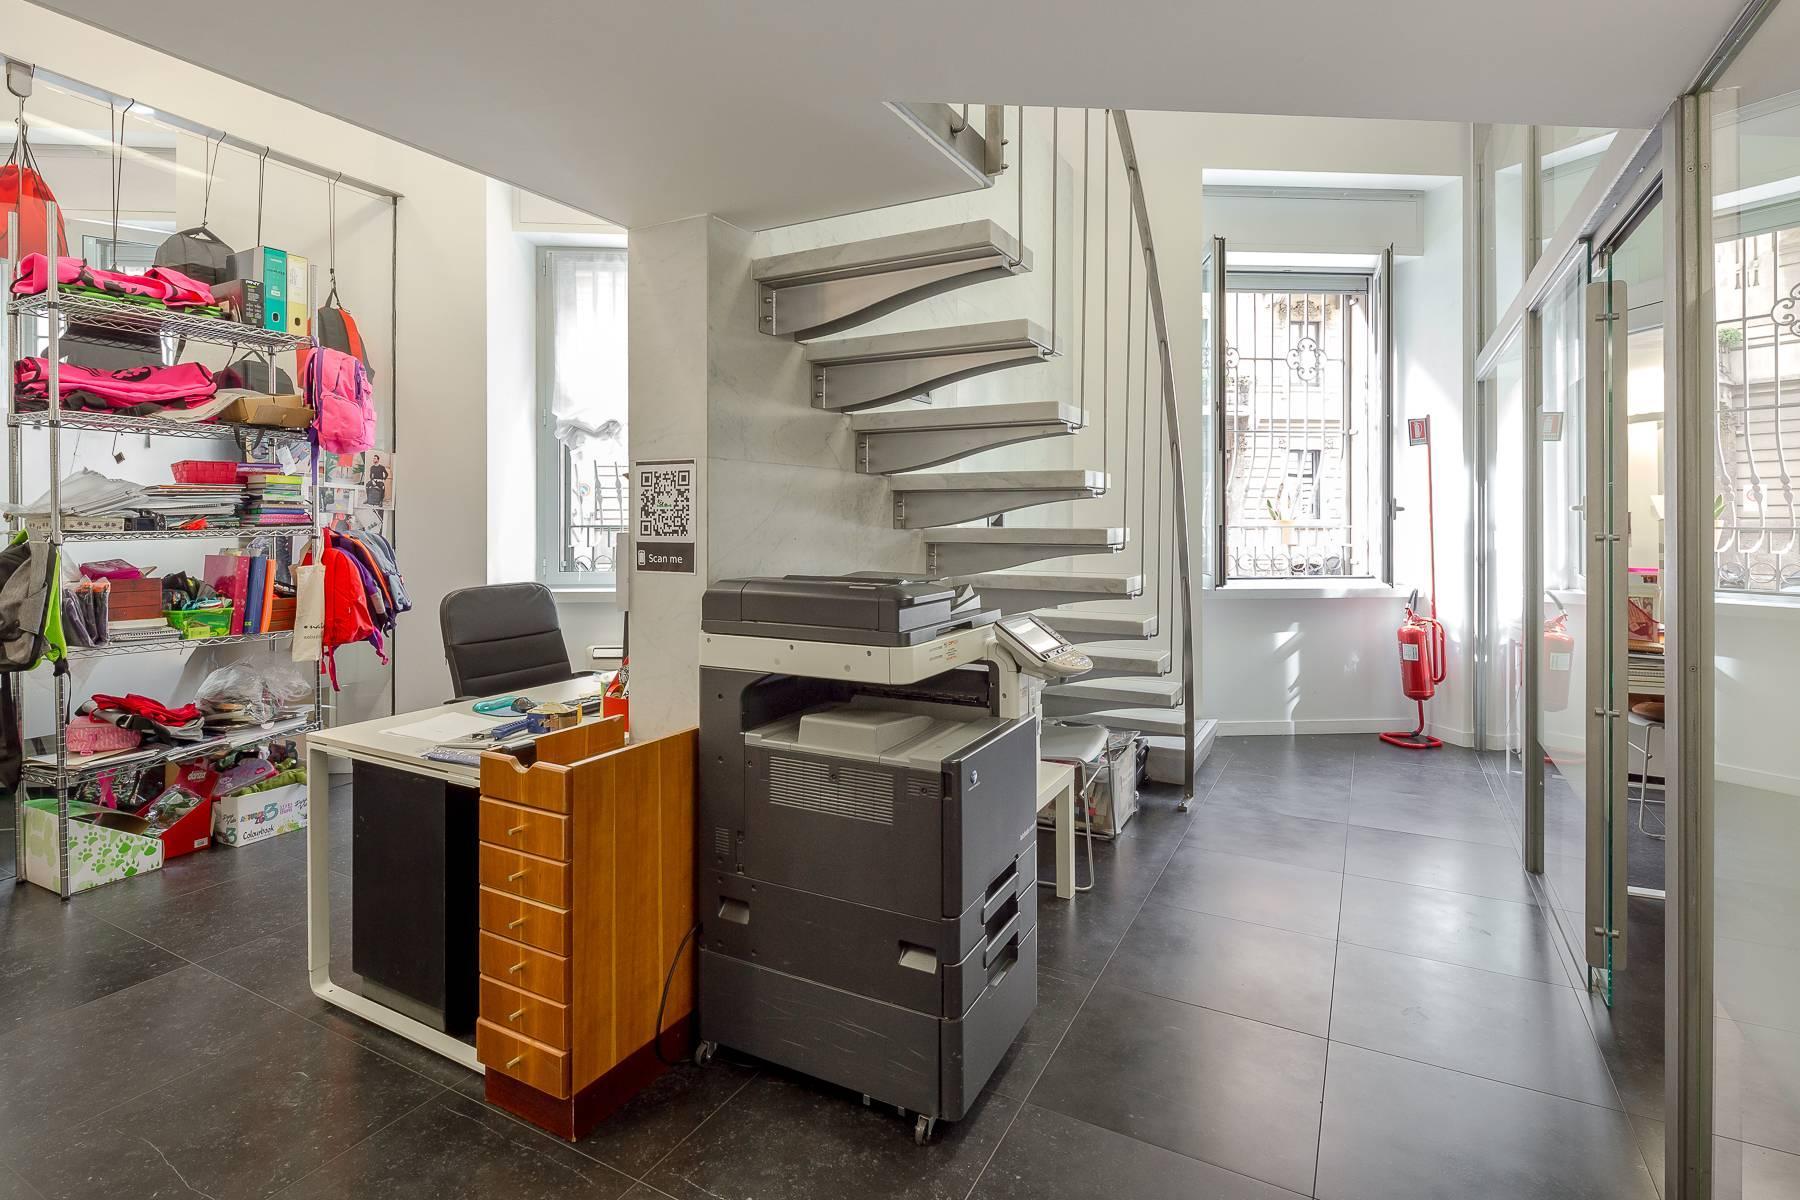 Opne-Space Büro / Wohnimmobilie auf der Piazza Giovine Italia / Via Aurelio Saffi - 10